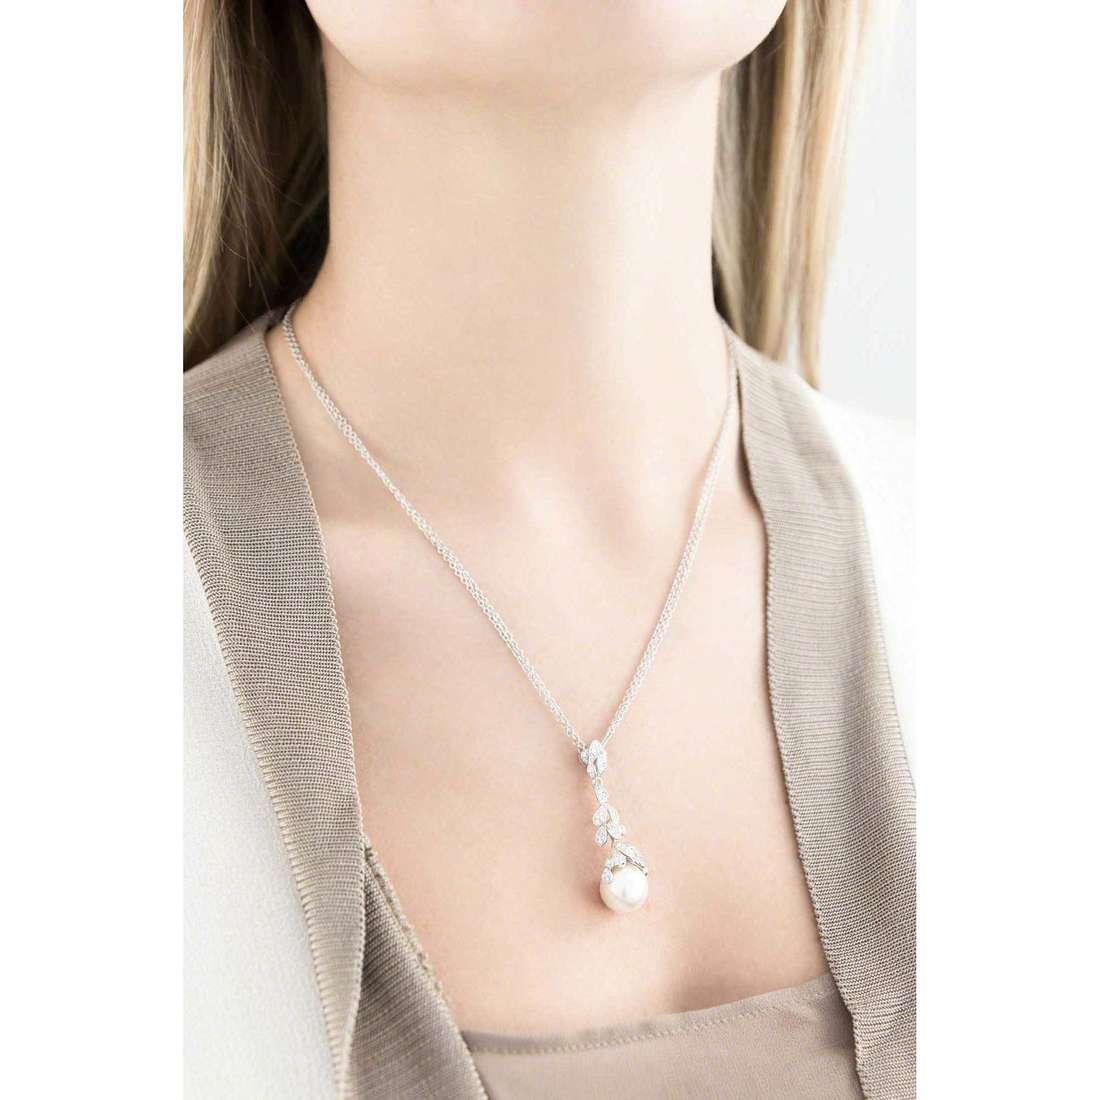 GioiaPura colliers femme 38324-01-00 indosso